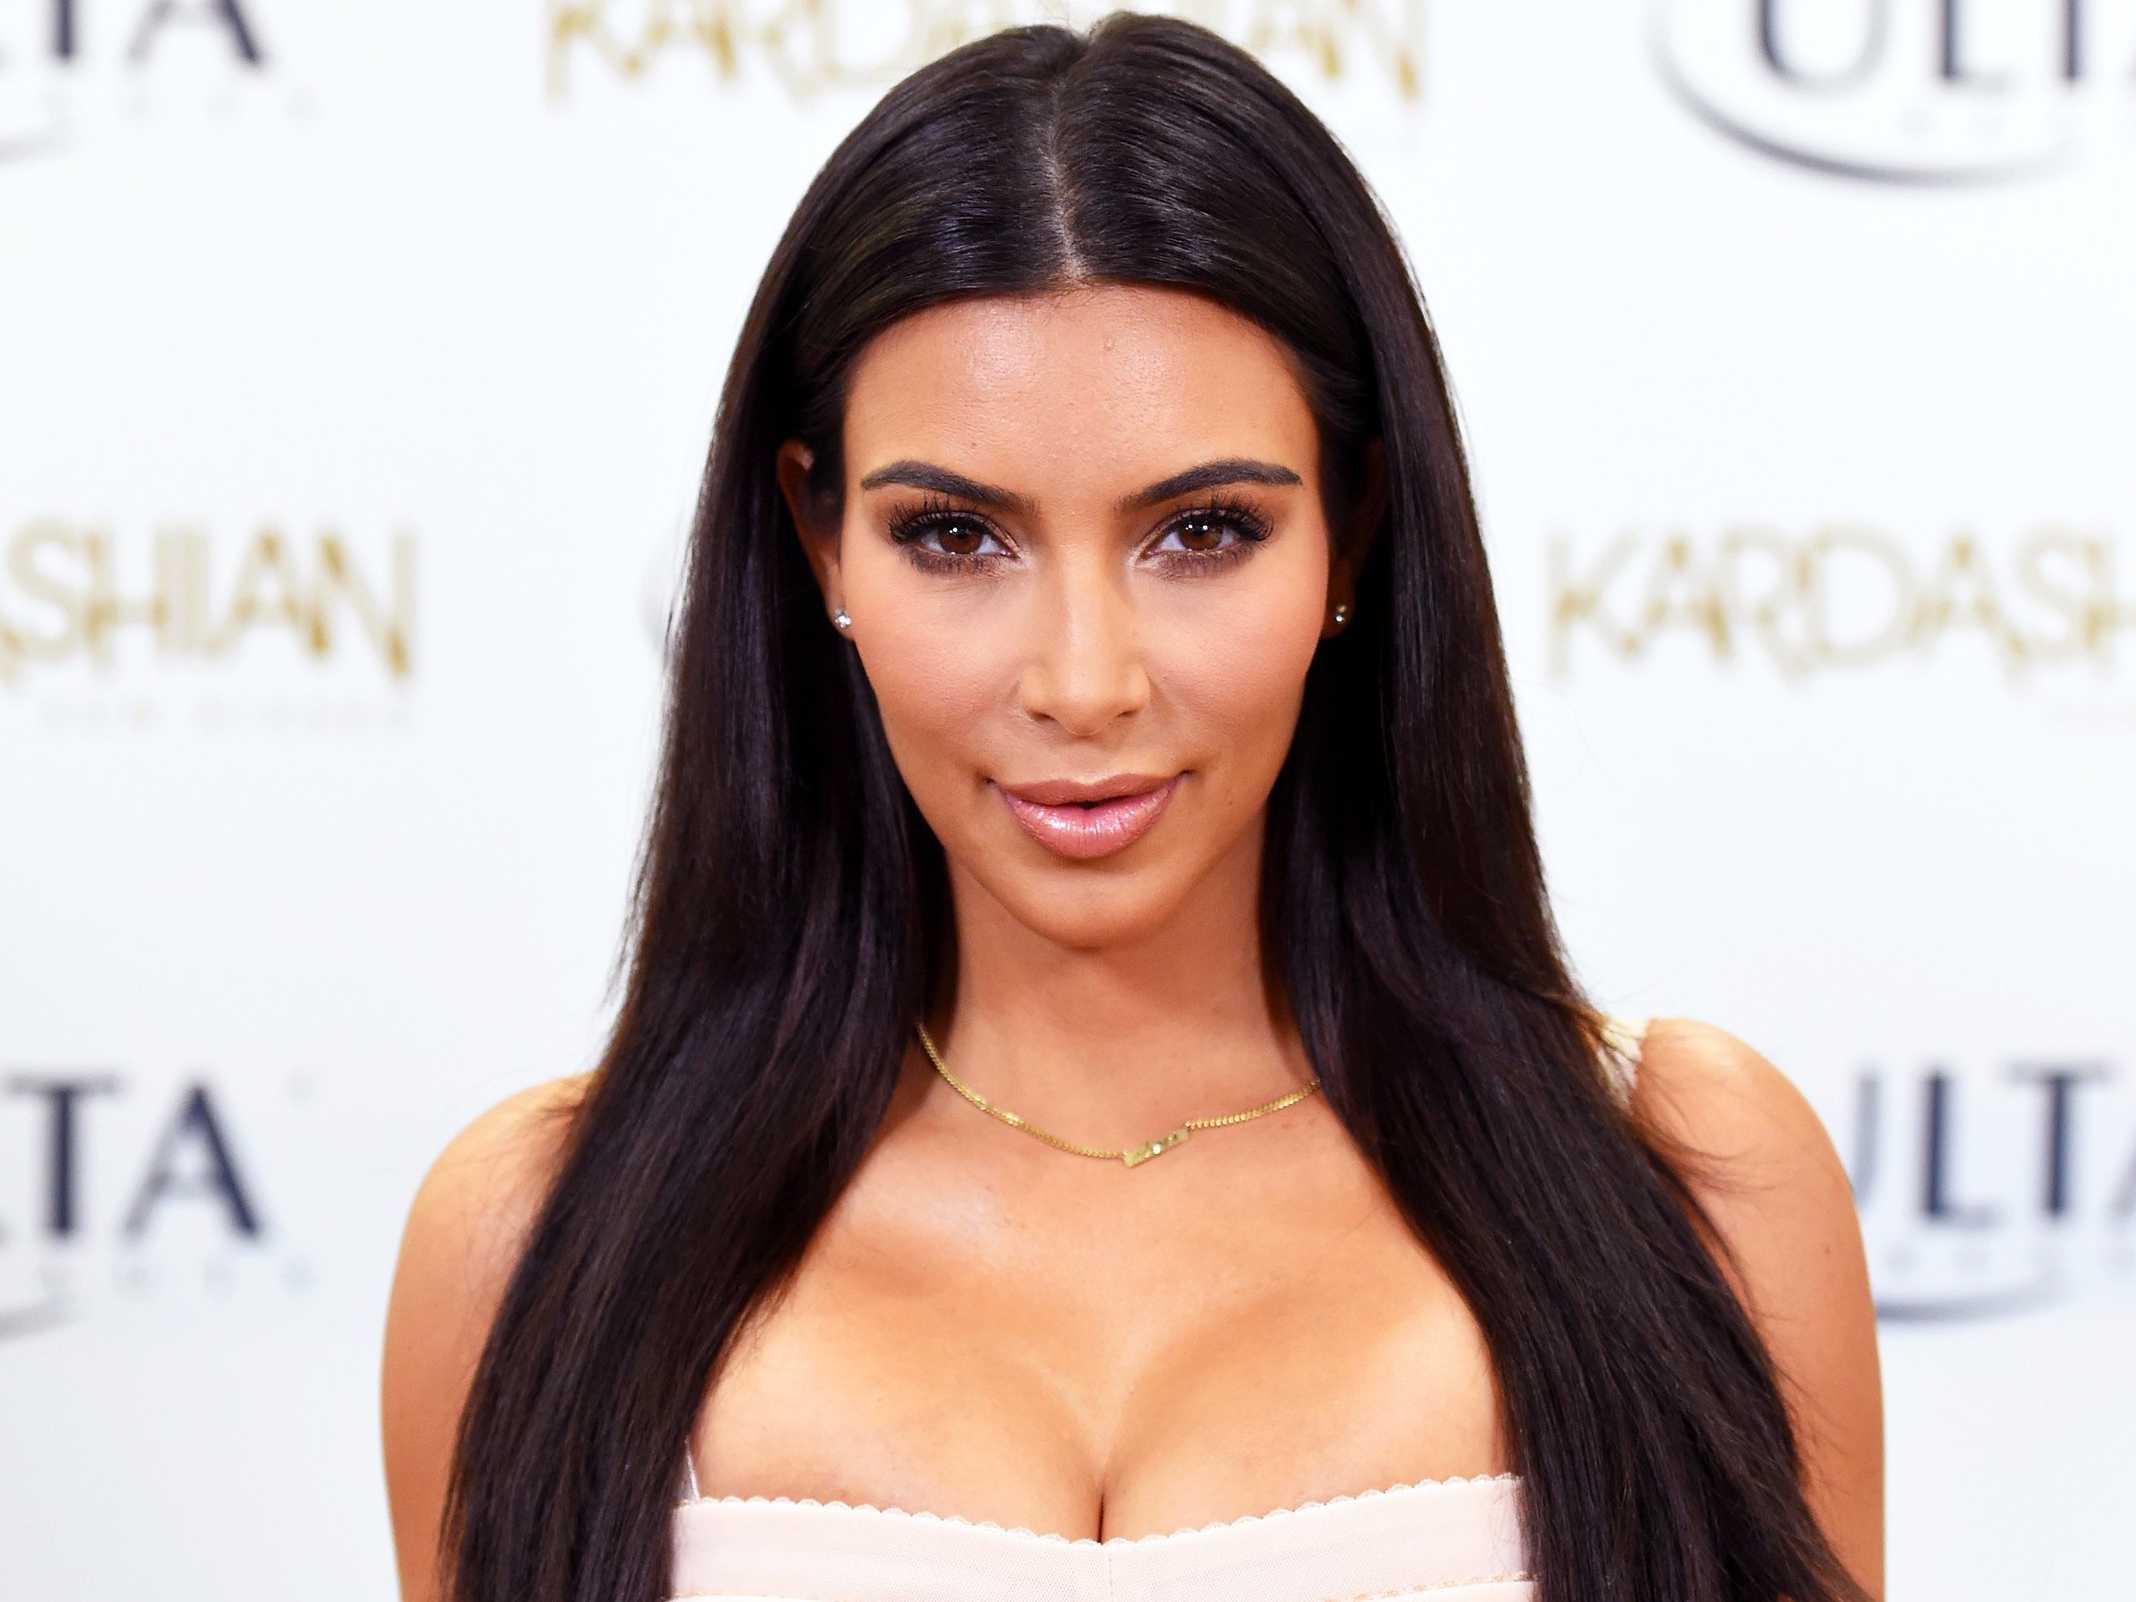 kim-kardashian-dezvaluit-cate-sute-de-mii-de-dolari-face-dintr-o-singura-postare-pe-instagram